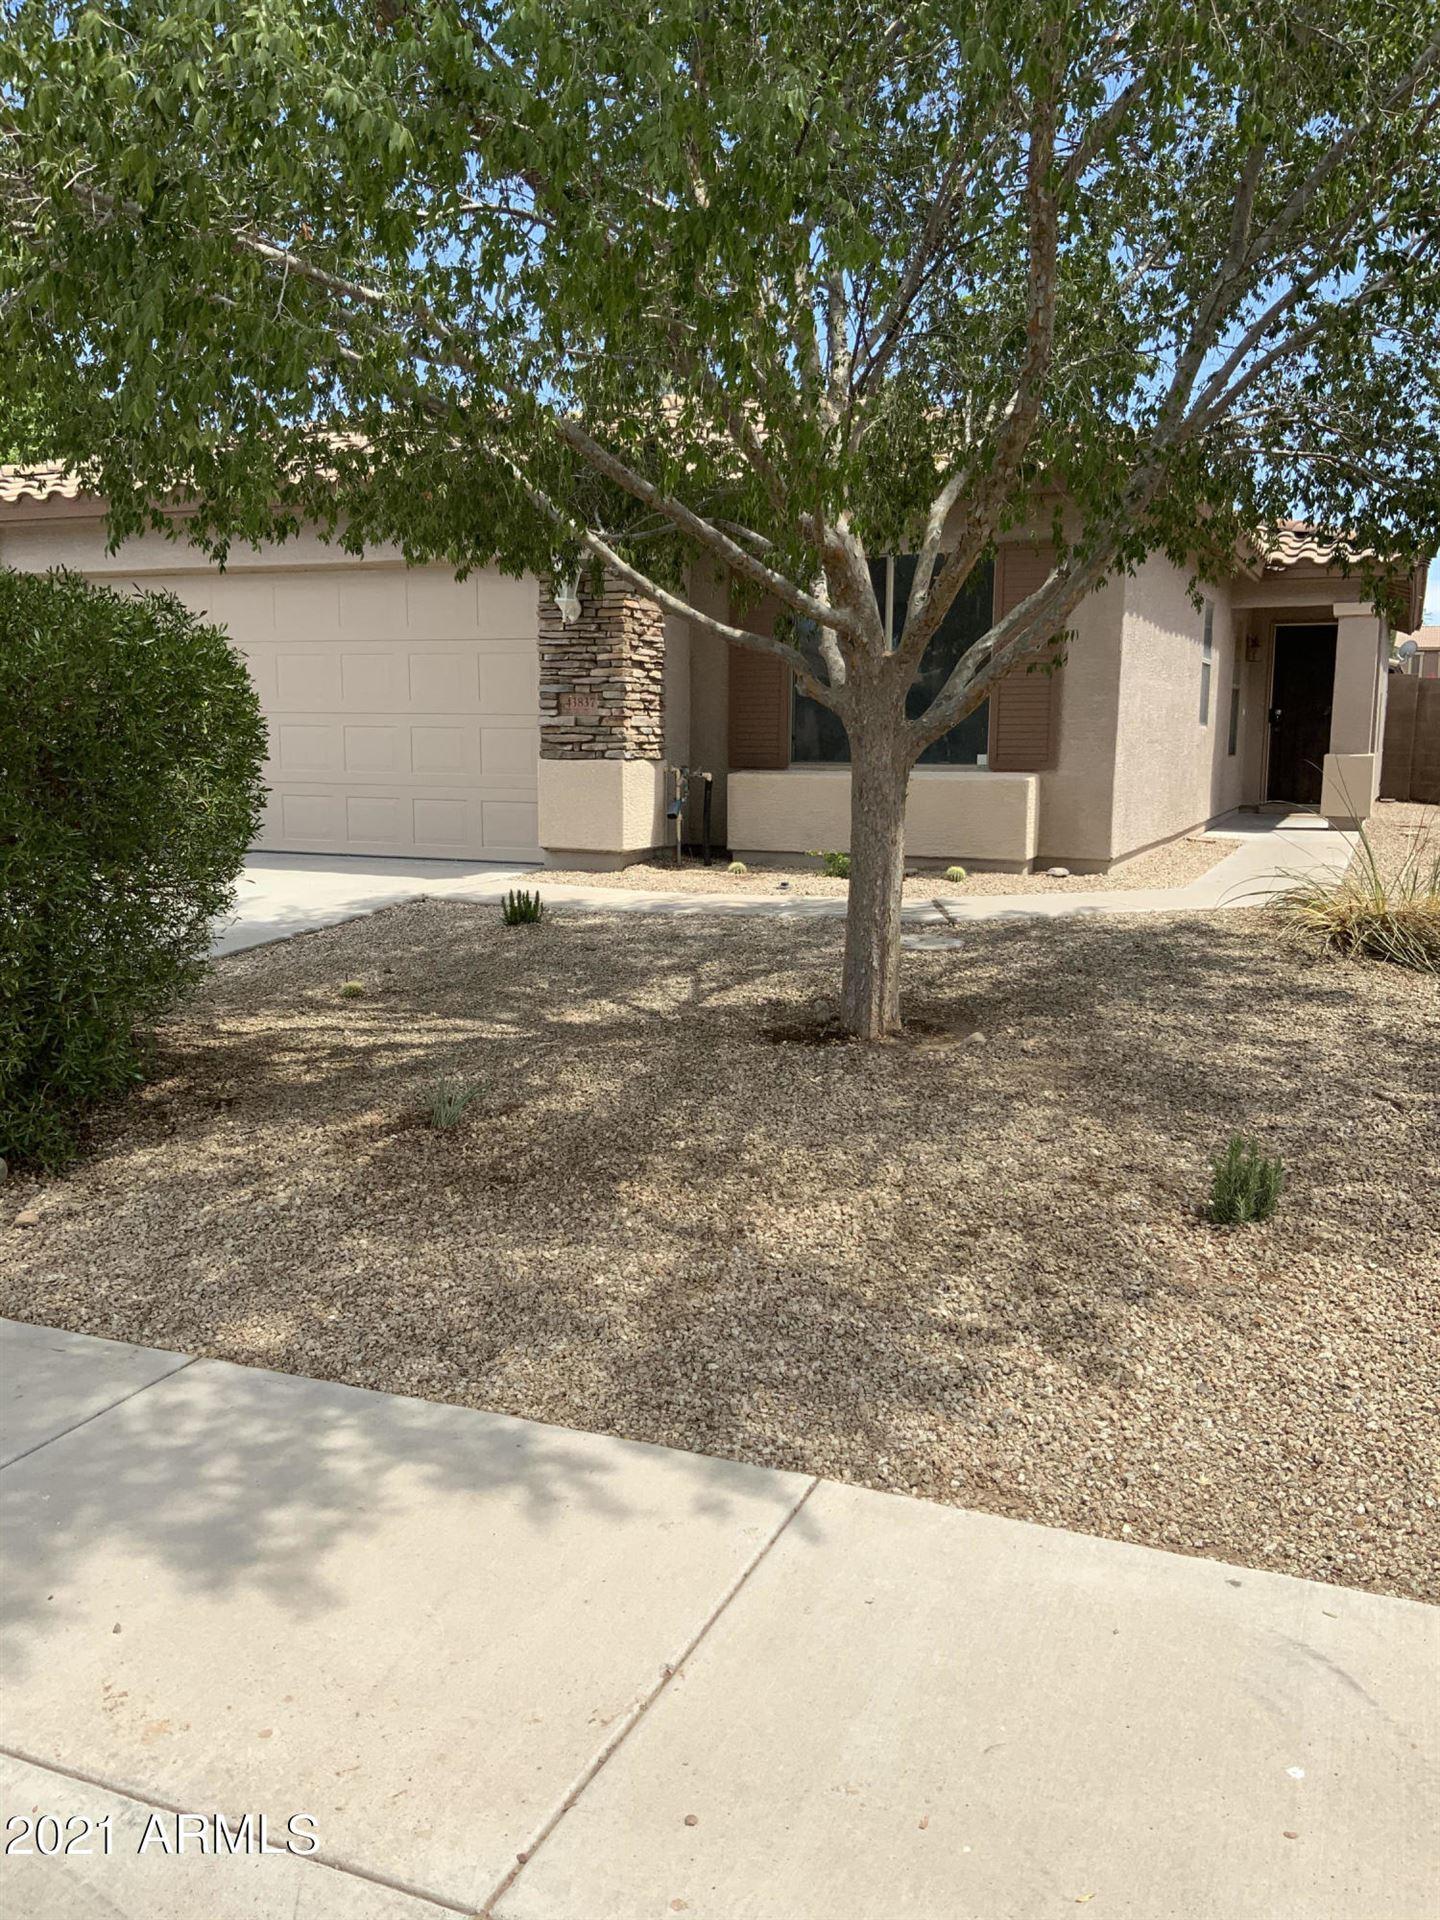 Photo for 43837 W BEDFORD Drive, Maricopa, AZ 85138 (MLS # 6251896)